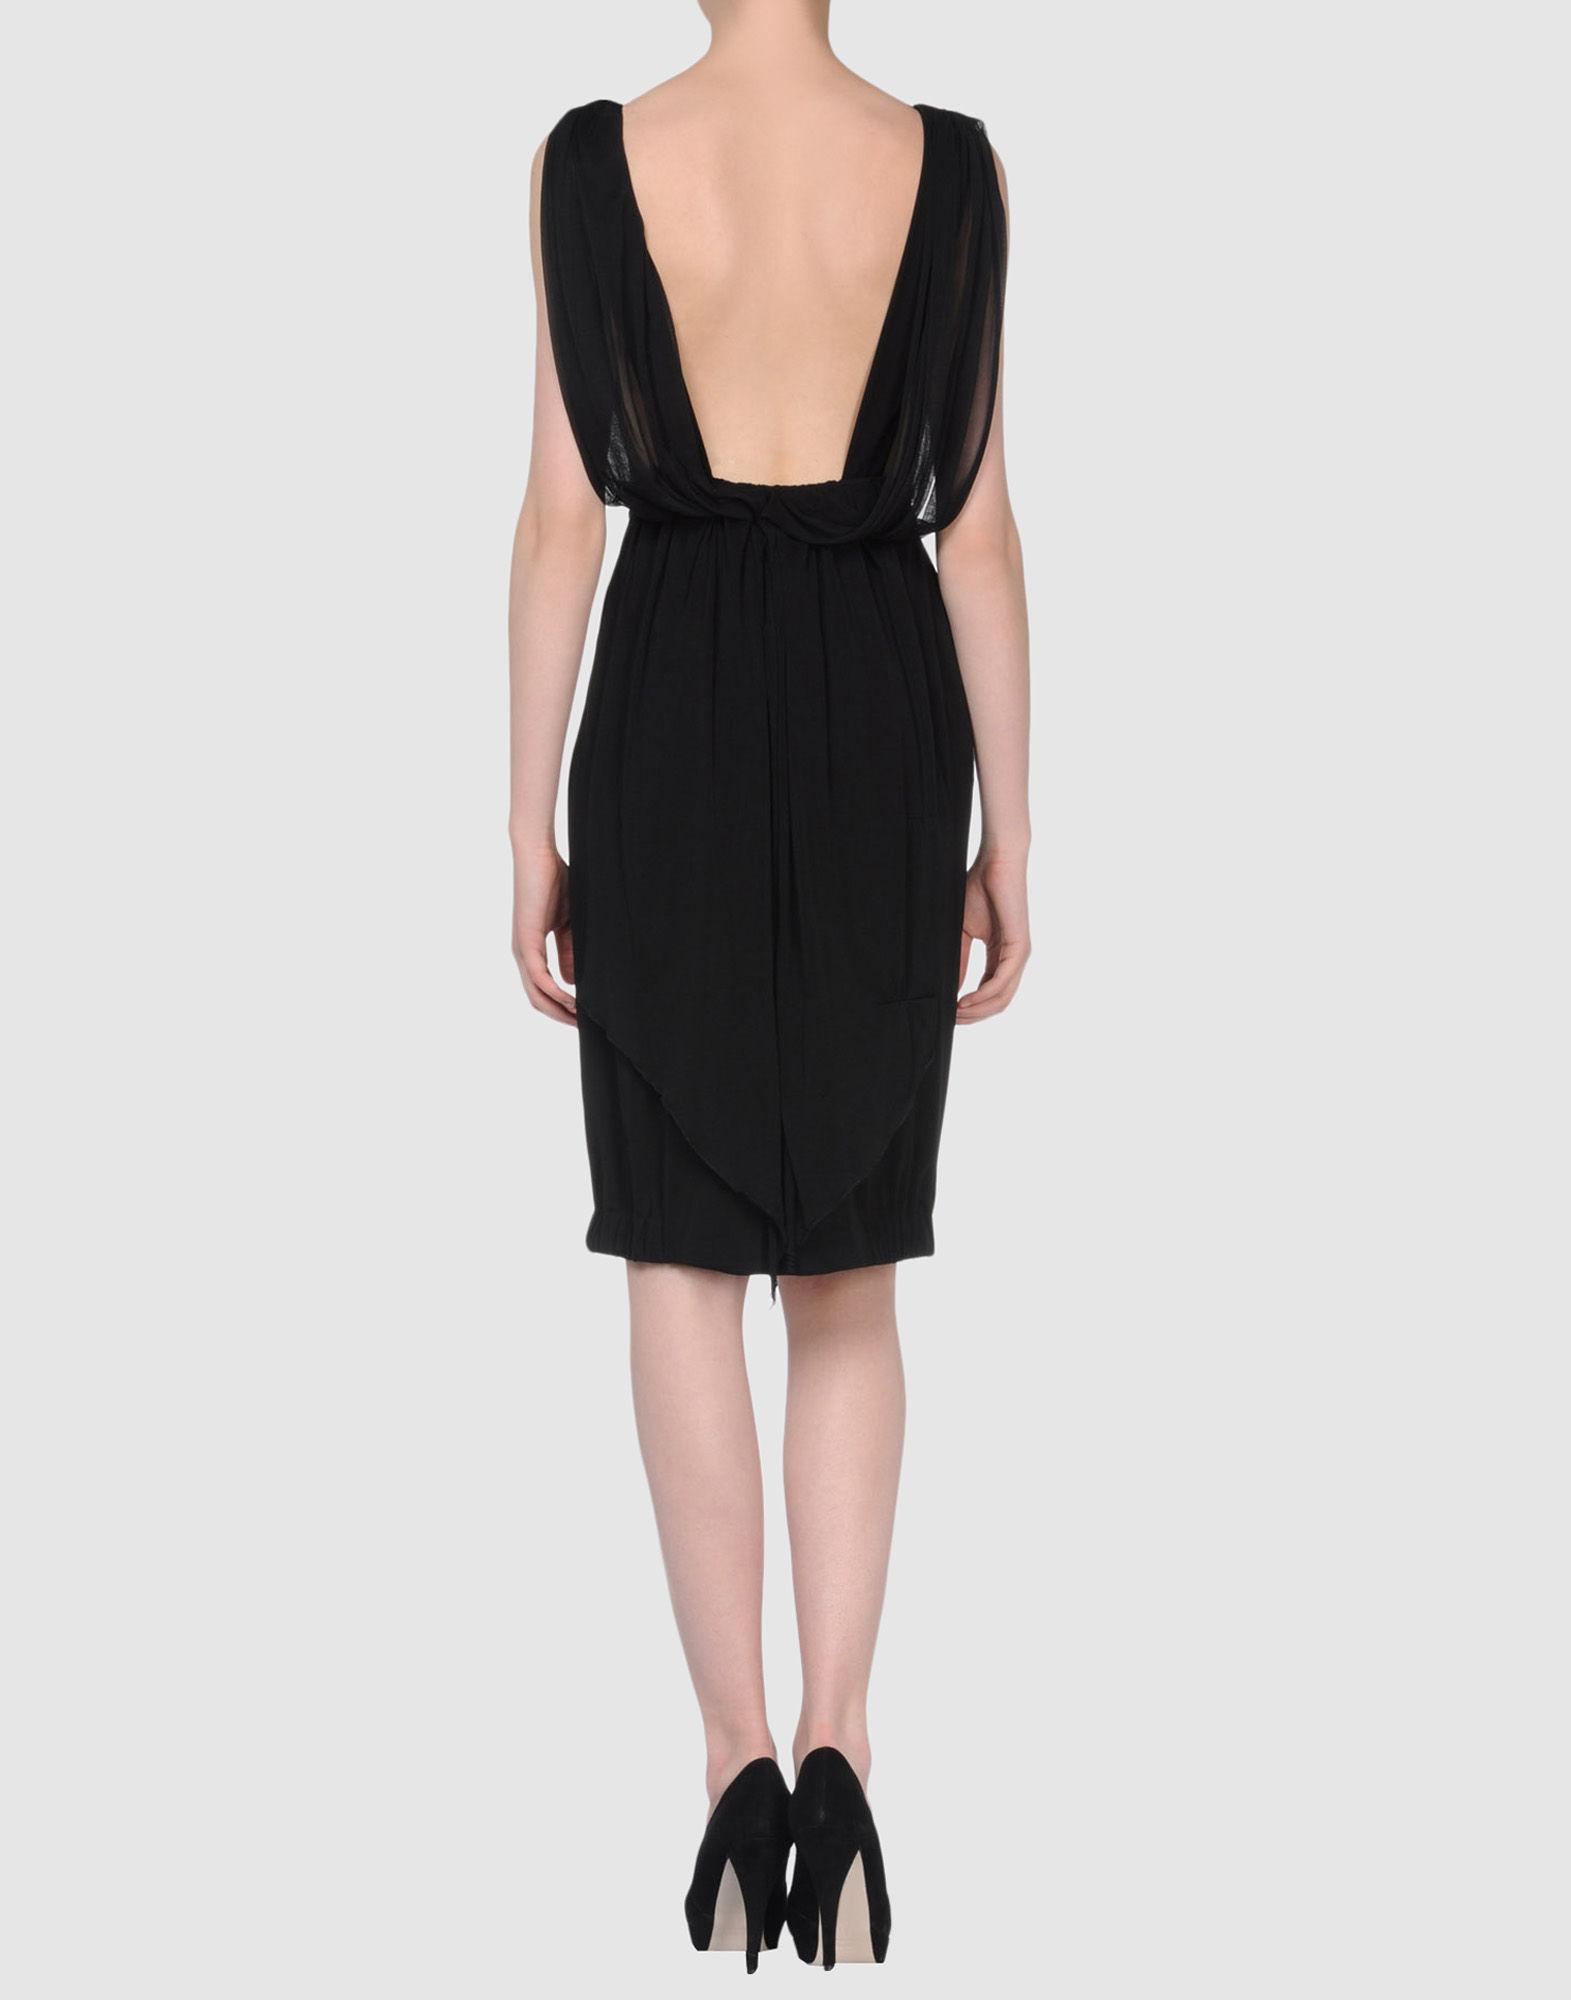 34178256CI 14 r - Βραδυνα Φορεματα Yves Saint Laurent Rive Gauche Κωδ.33